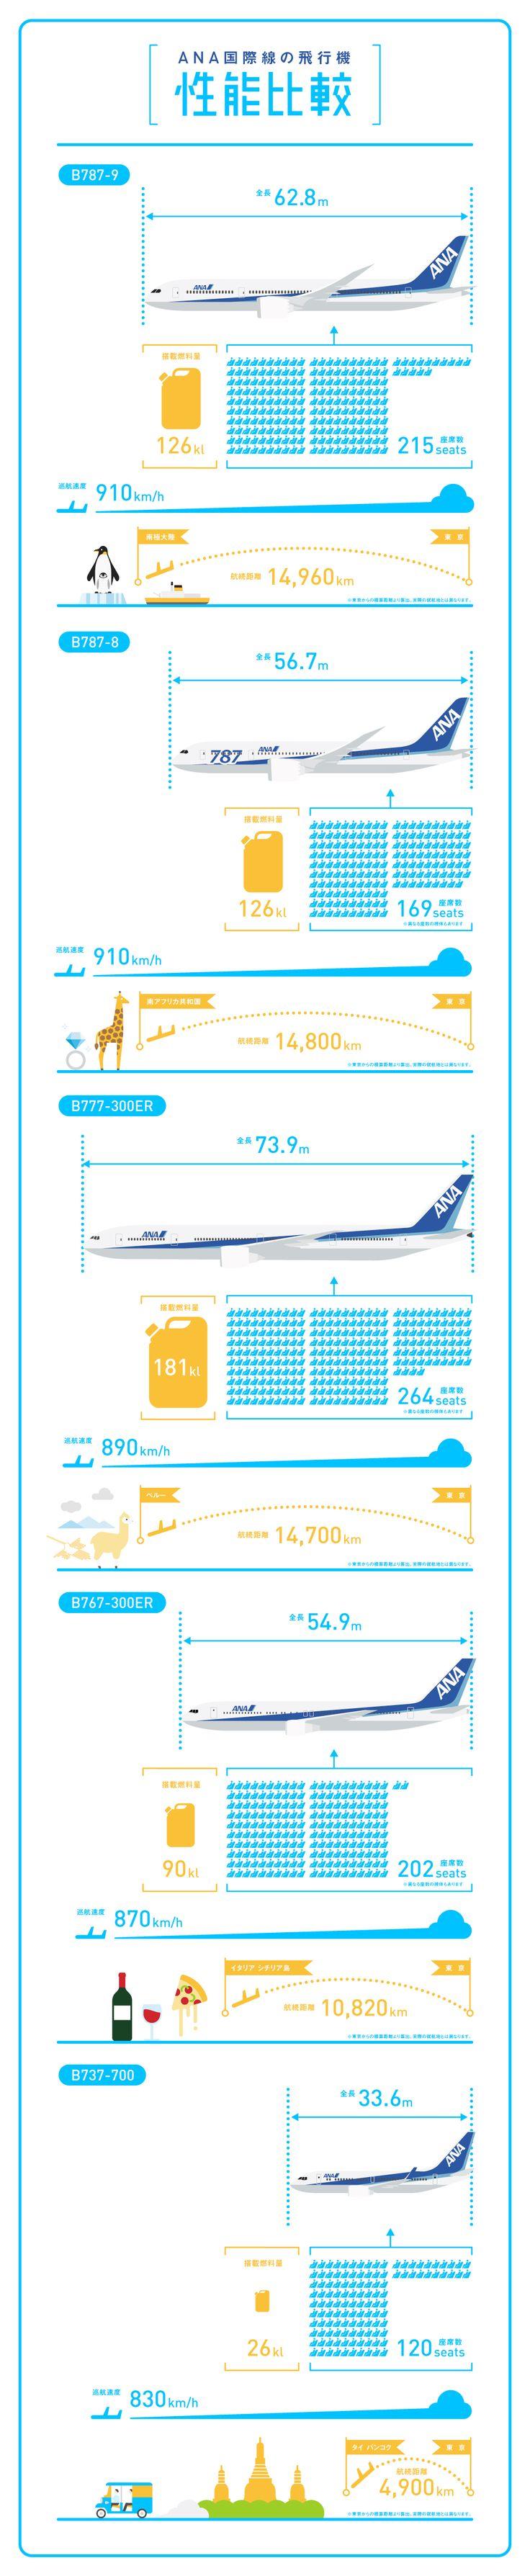 ANA国際線の飛行機 性能比較 Infographics ANA Travel & Life